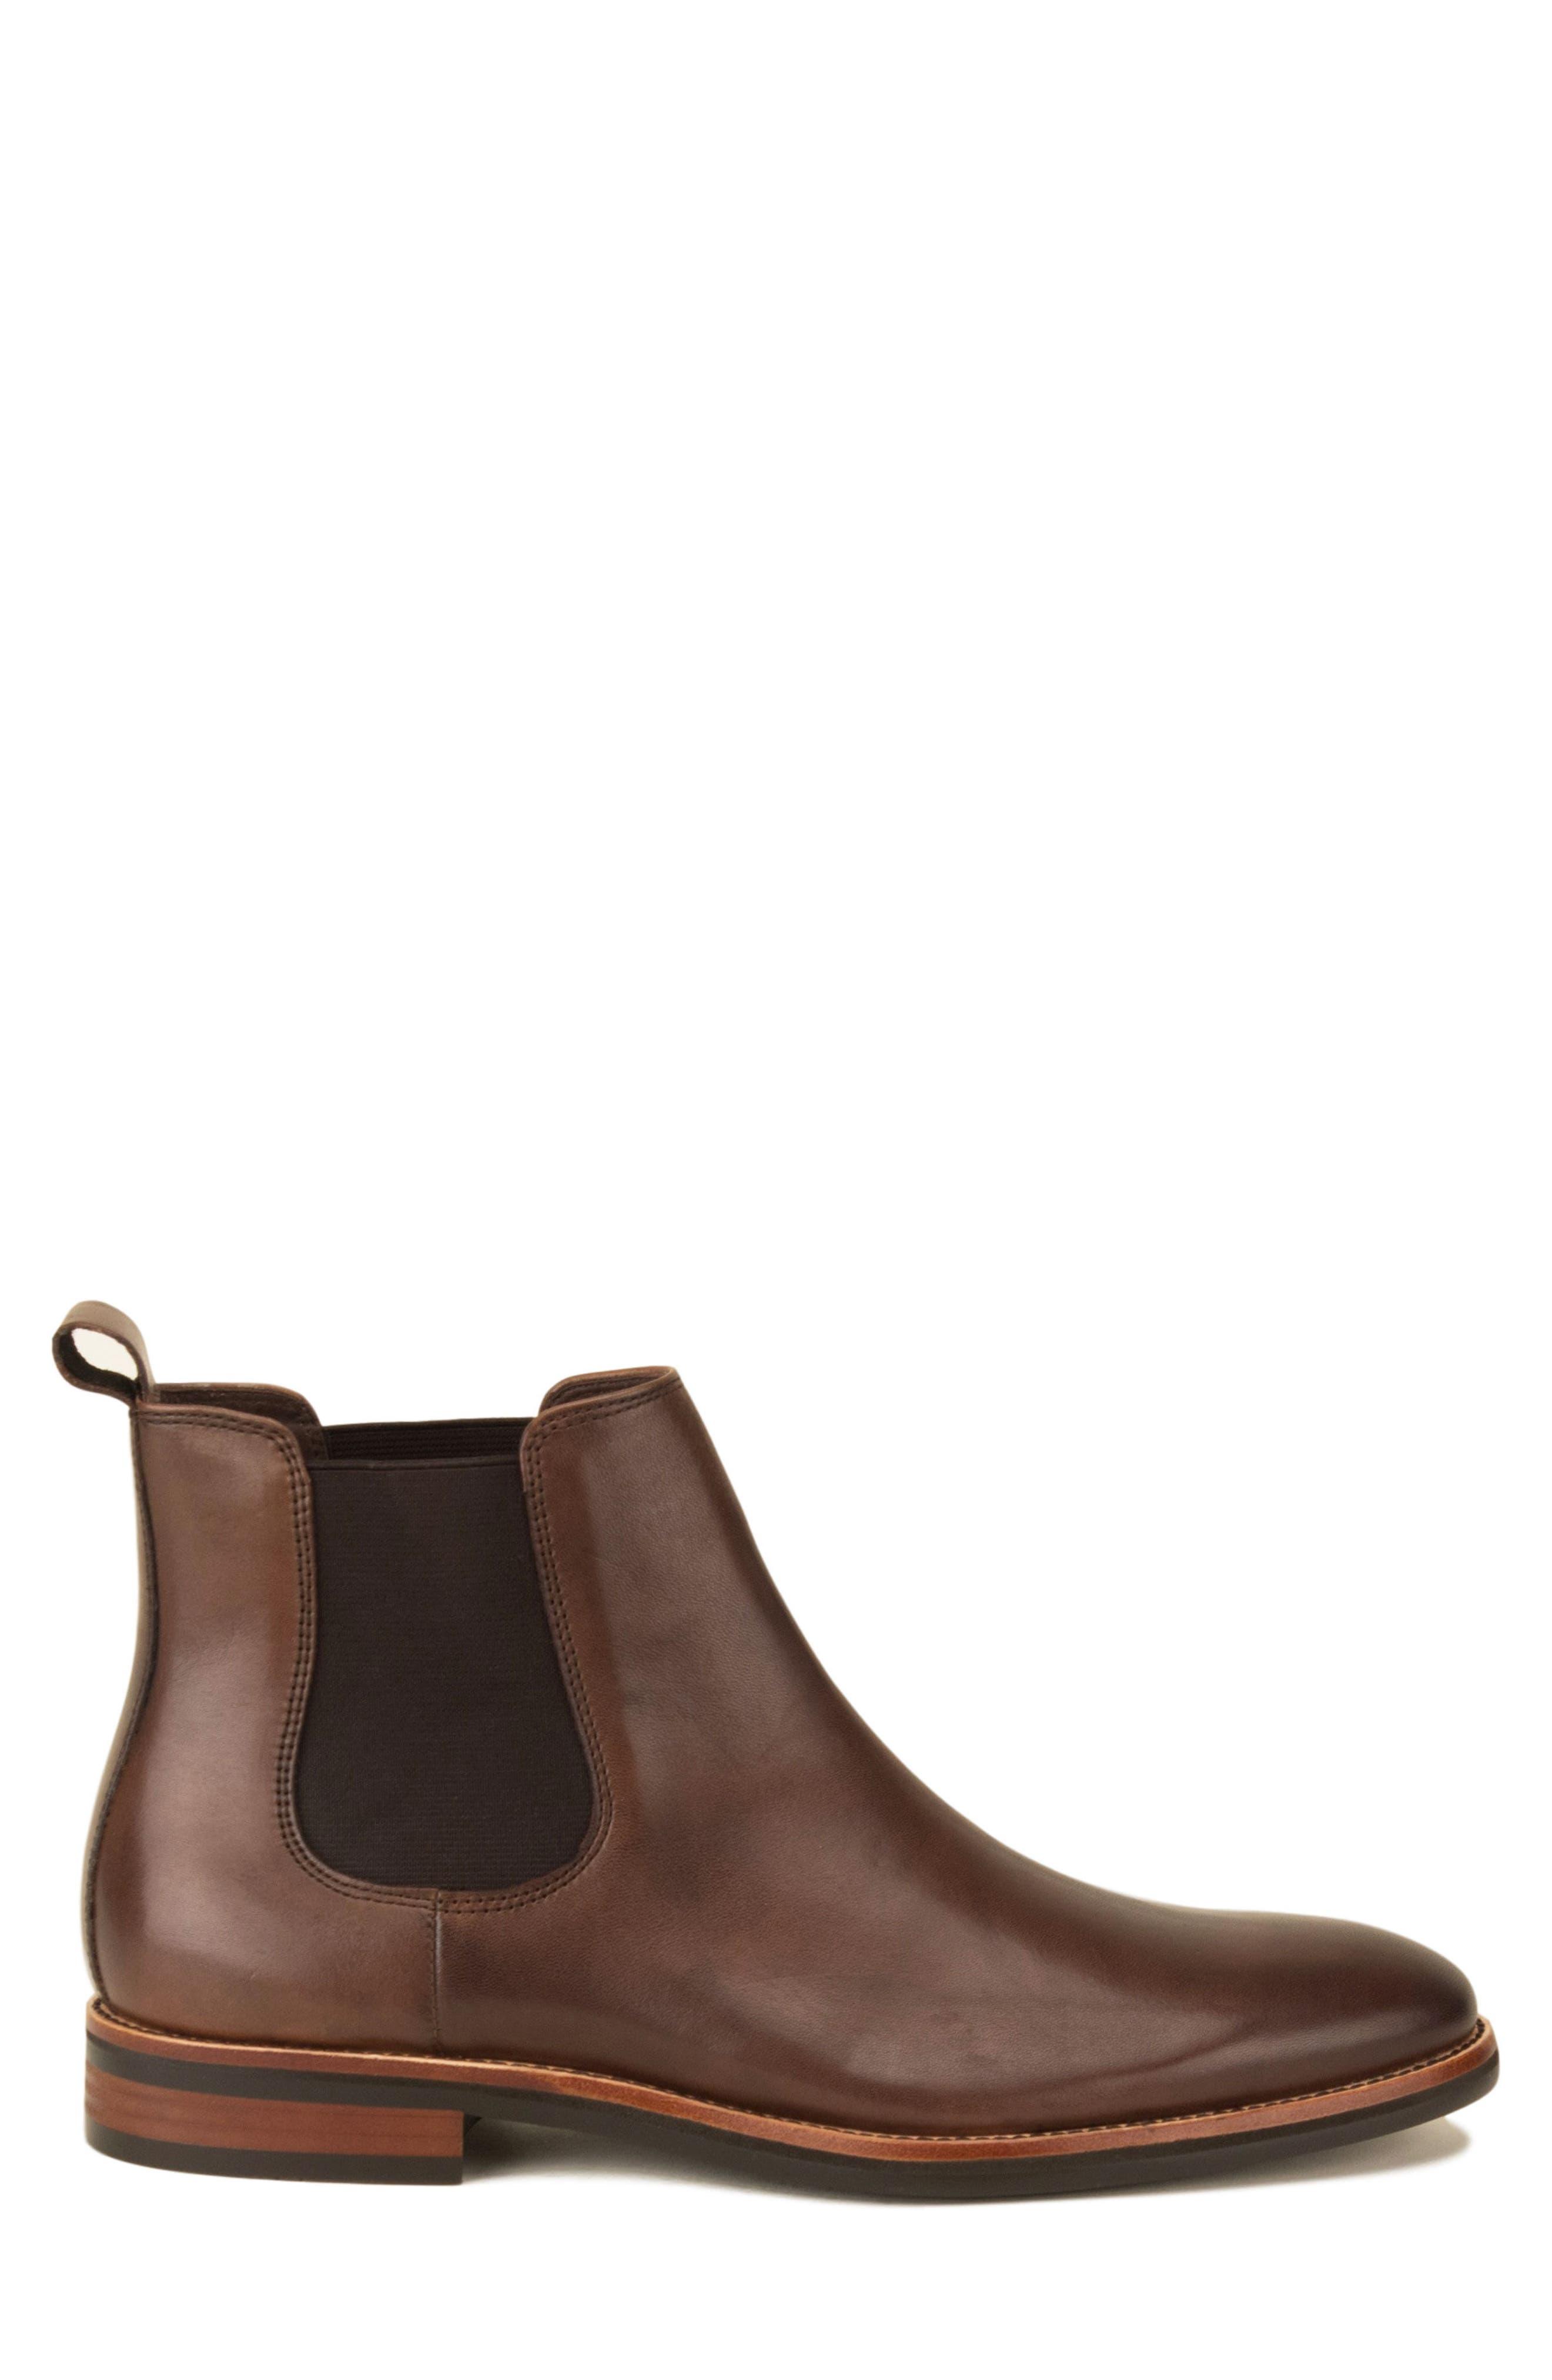 'Wallis' Chelsea Boot,                             Alternate thumbnail 3, color,                             217